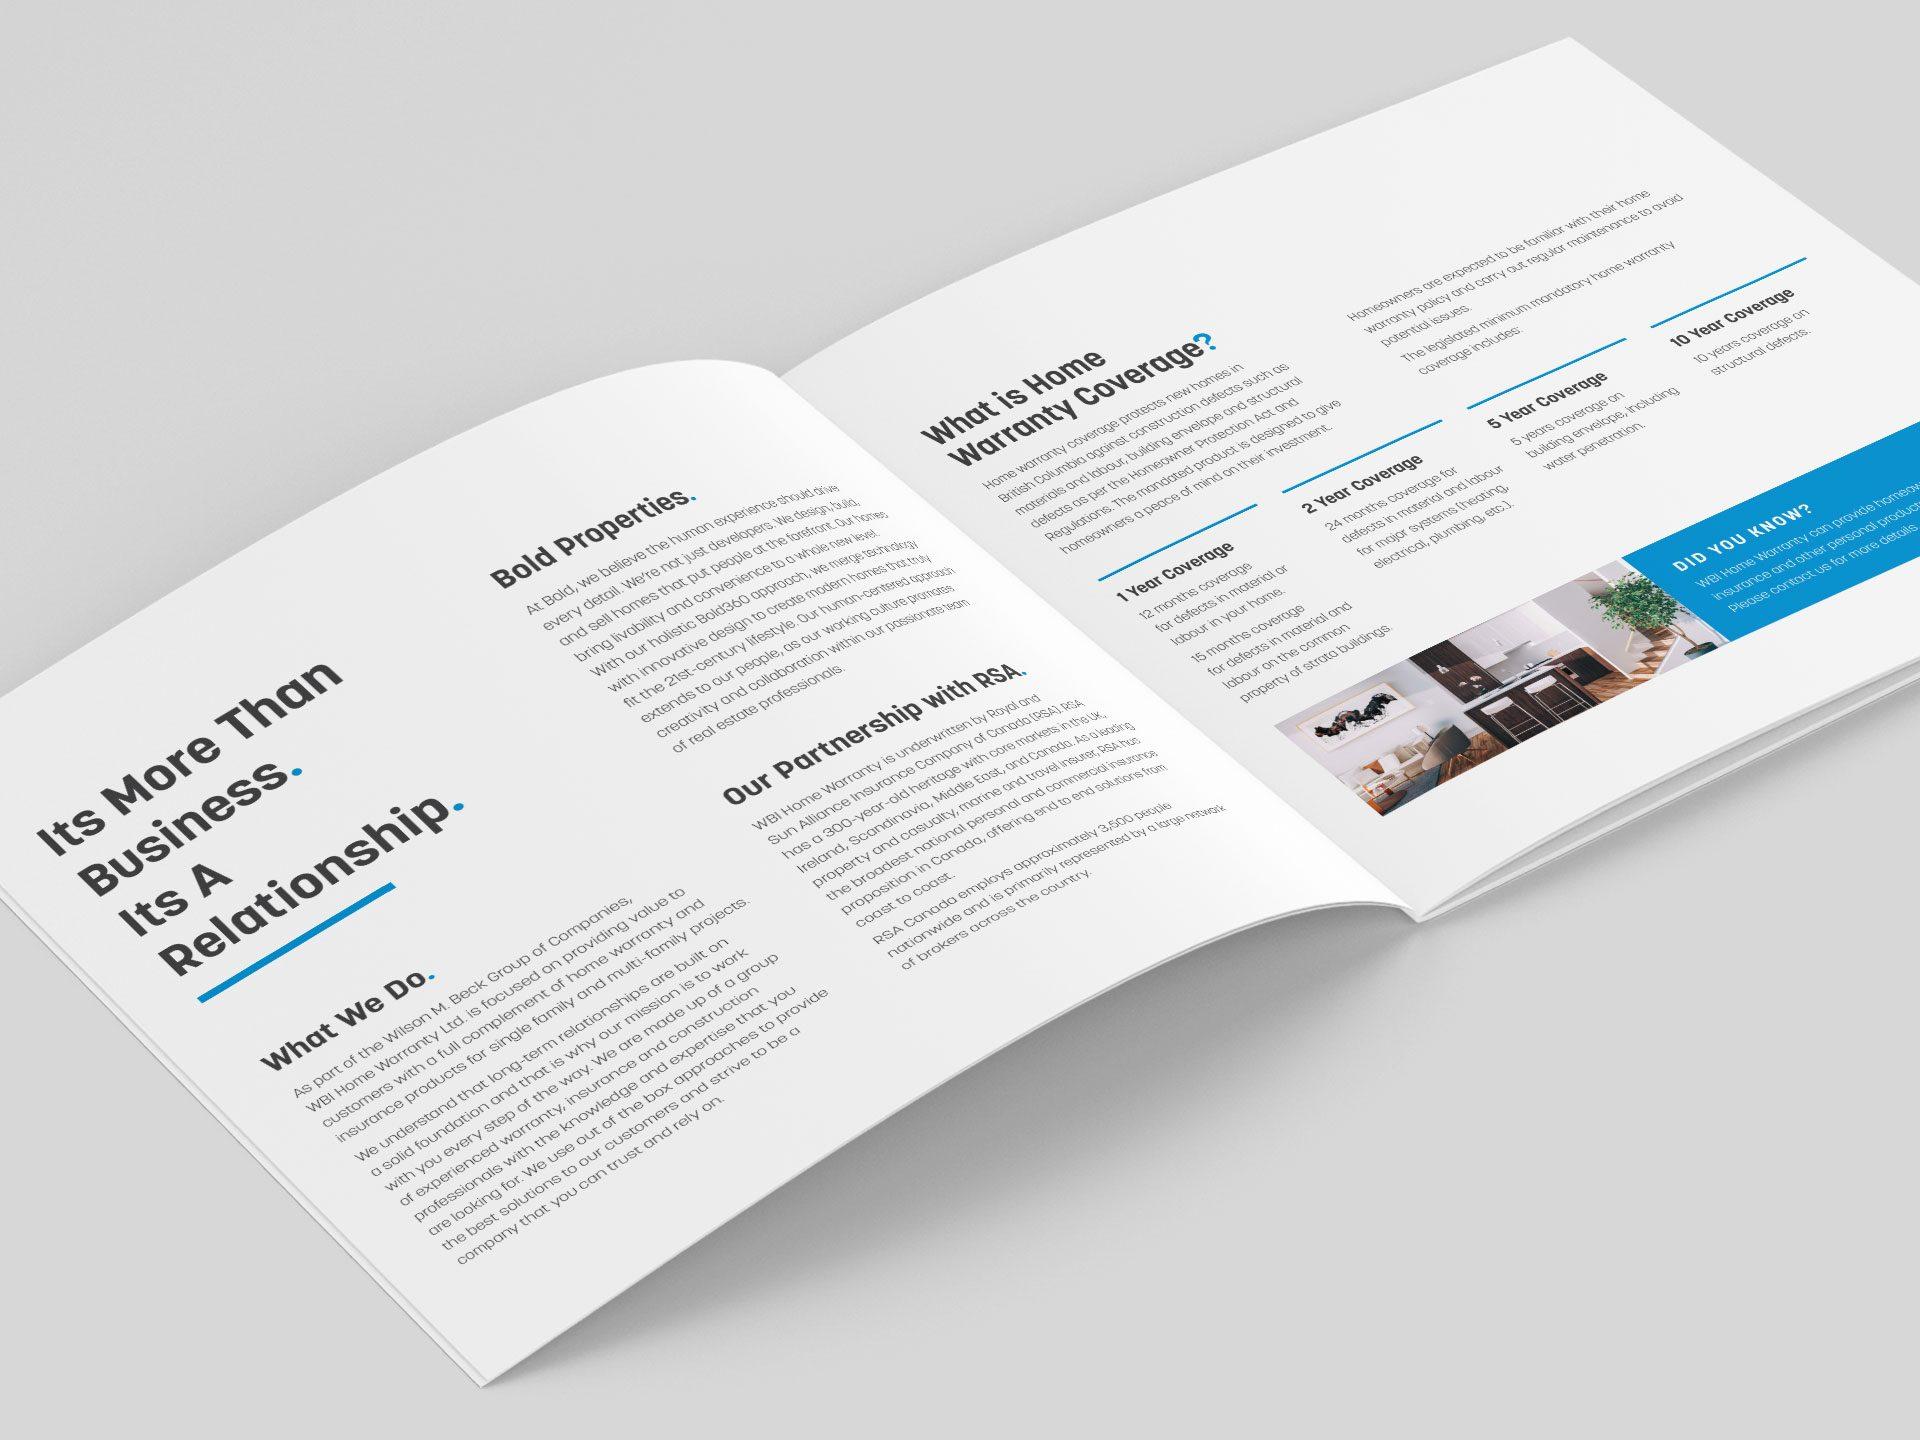 Y5 Creative Case Studies 2017 Brochure 1 WBI Home Warranty